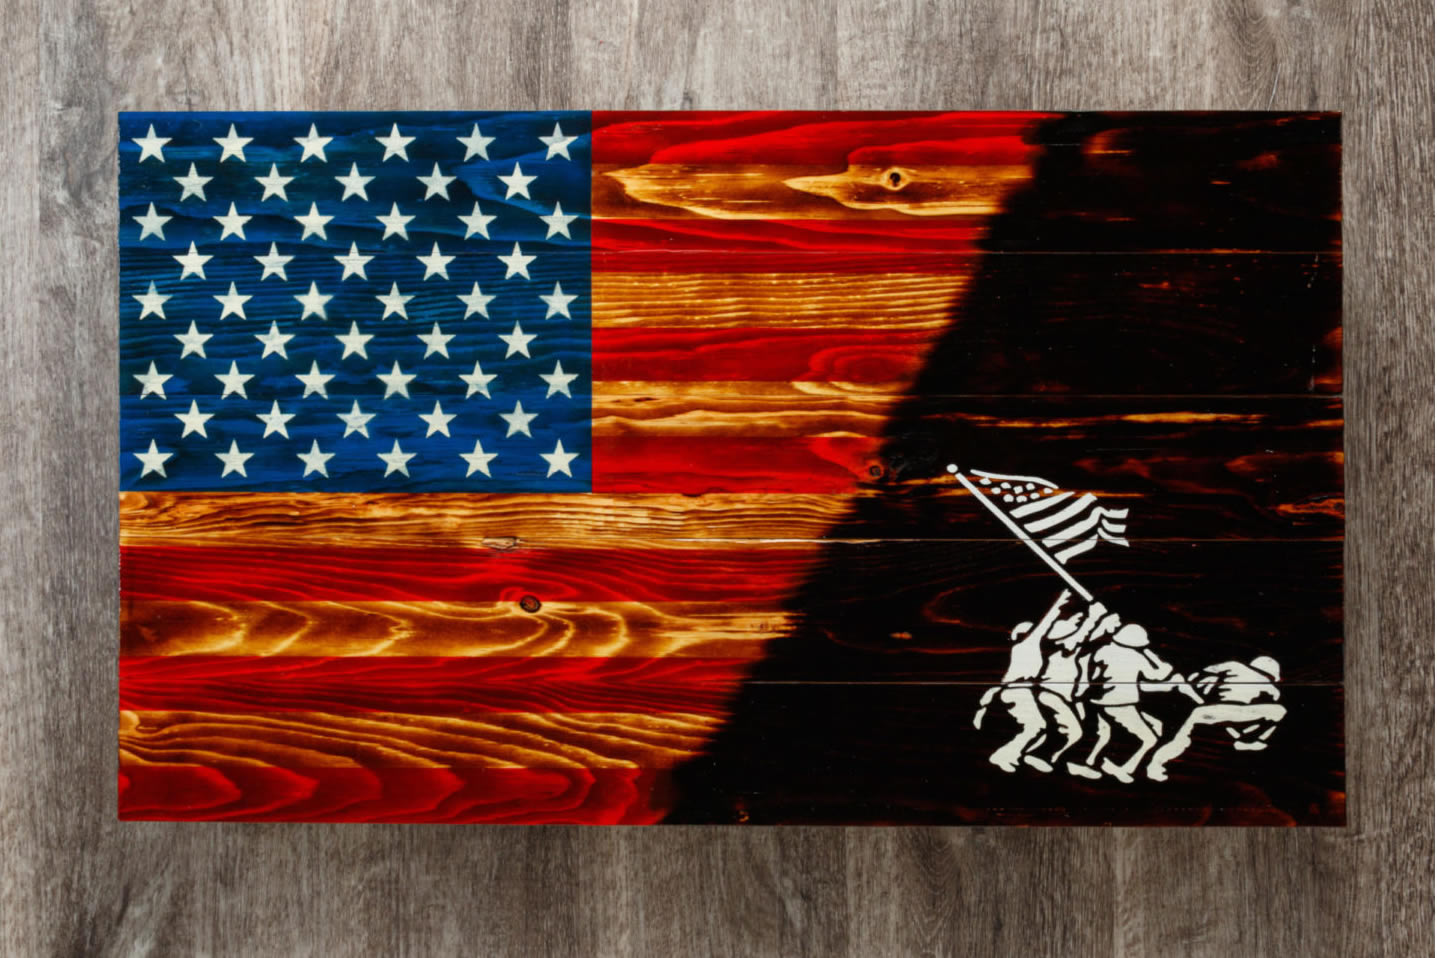 Iwo jima American flag wall art